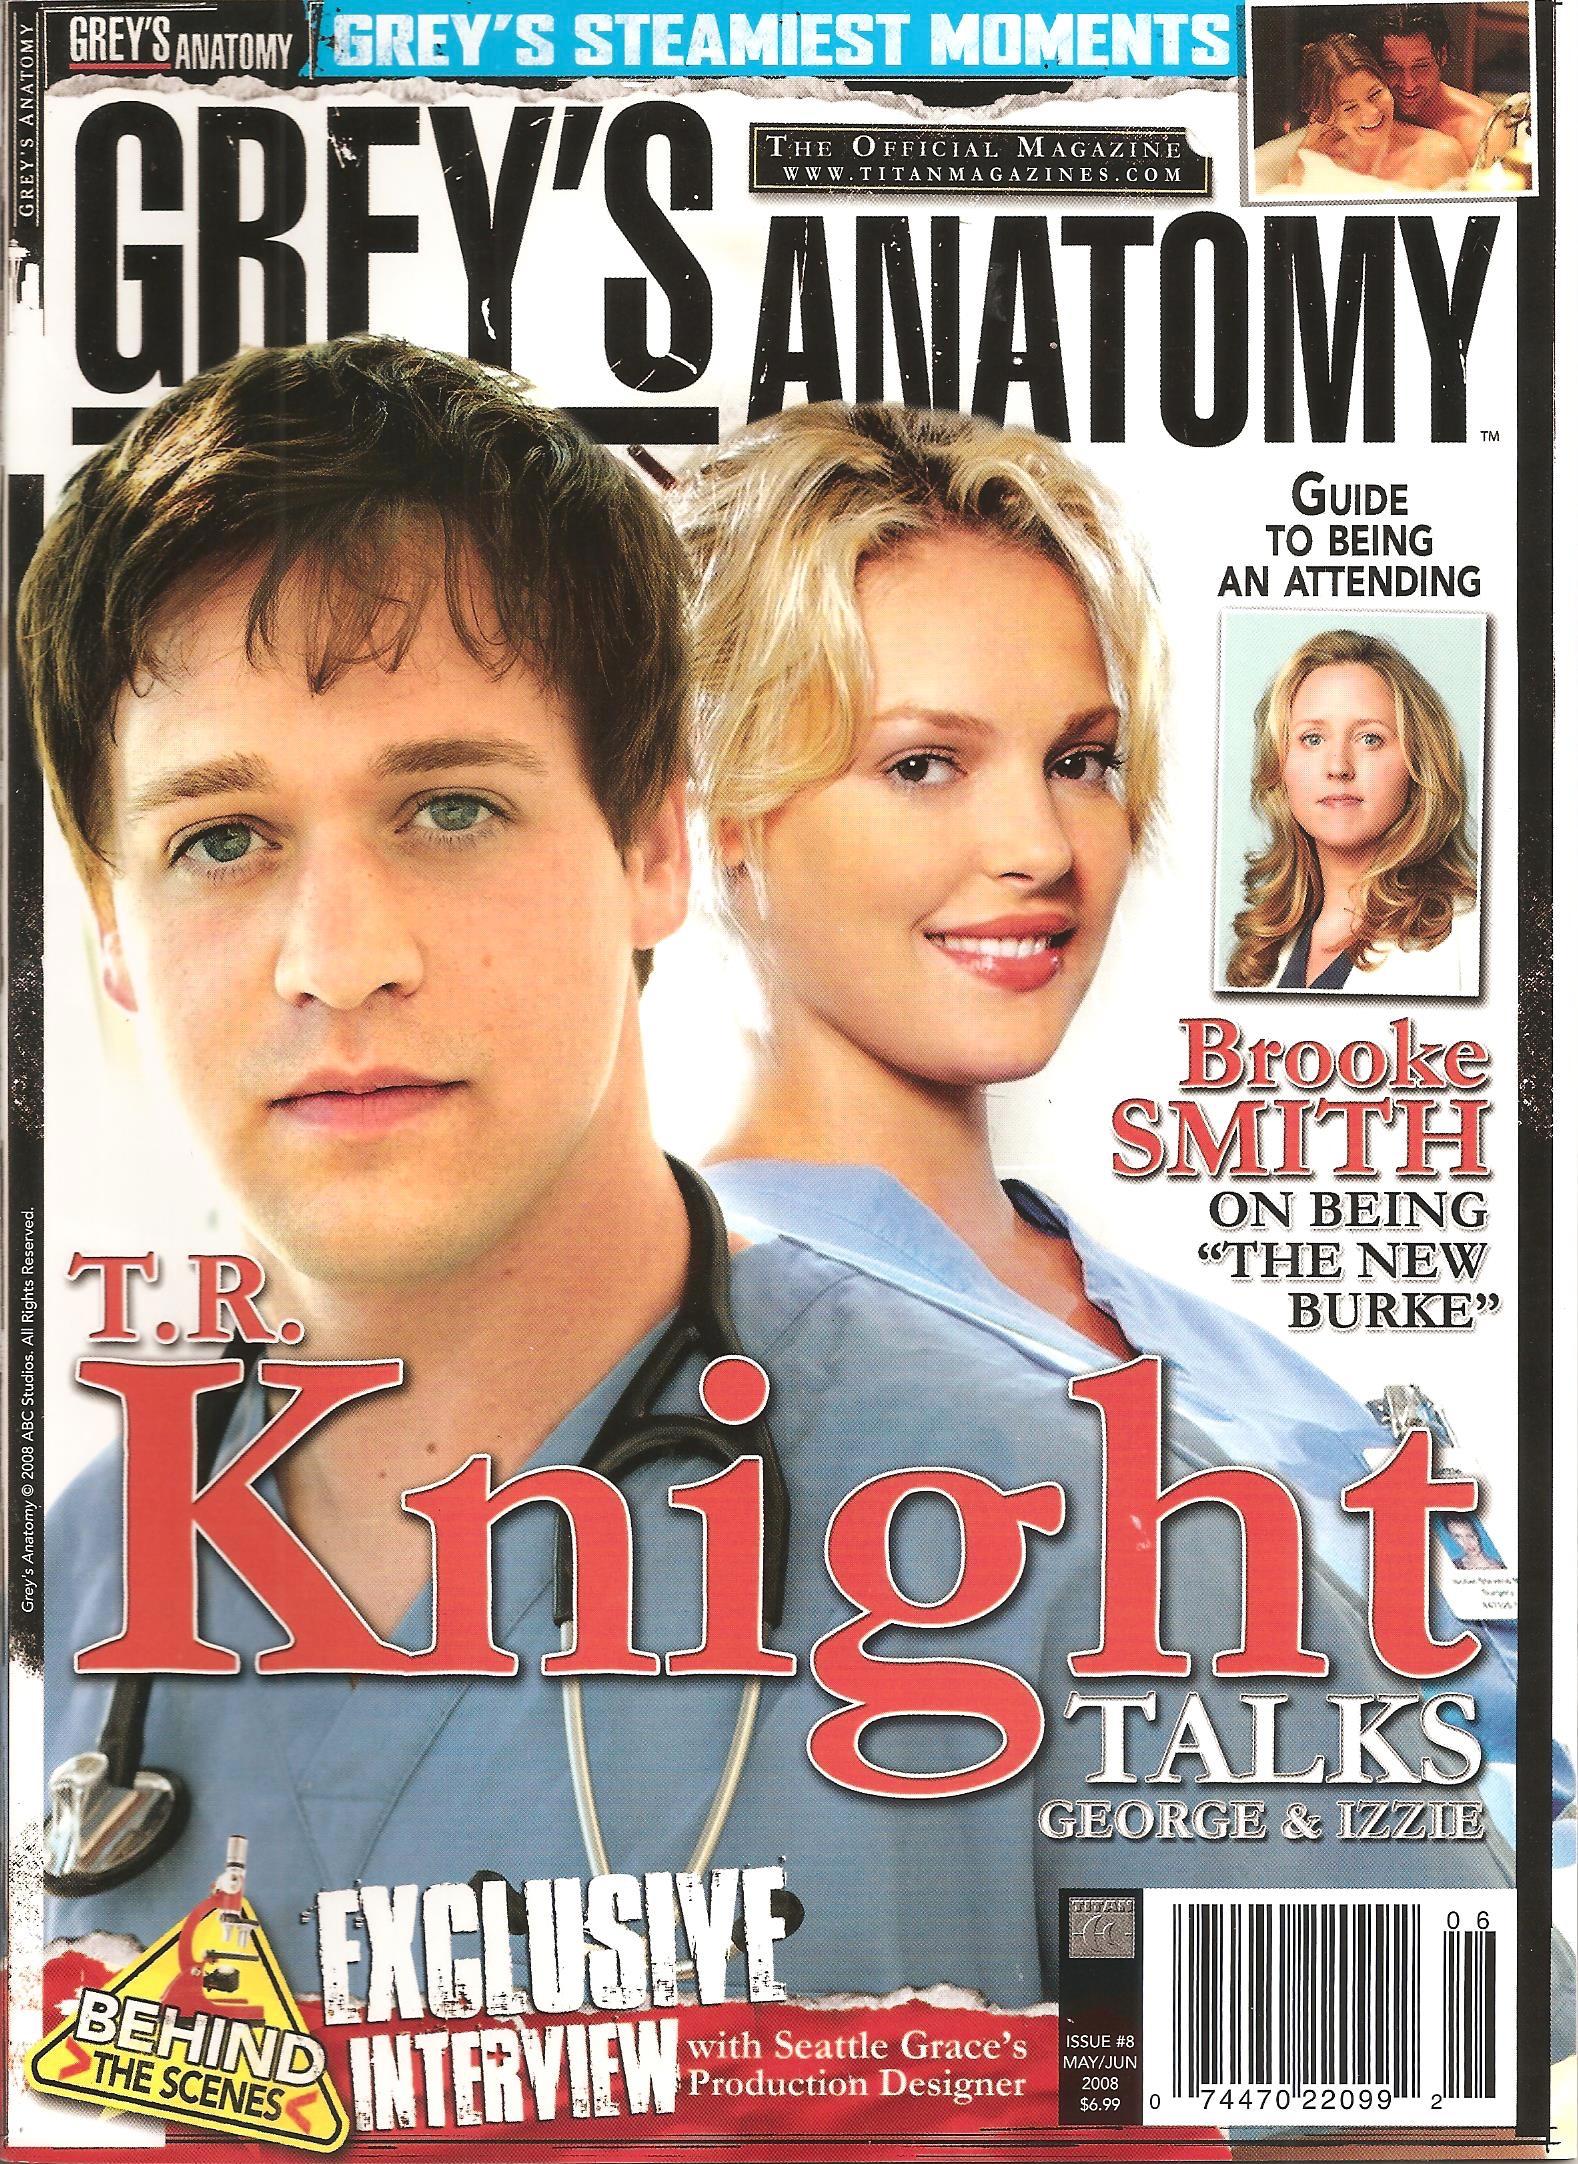 Greys Anatomy Official Magazine Issue 8 Greys Anatomy Universe